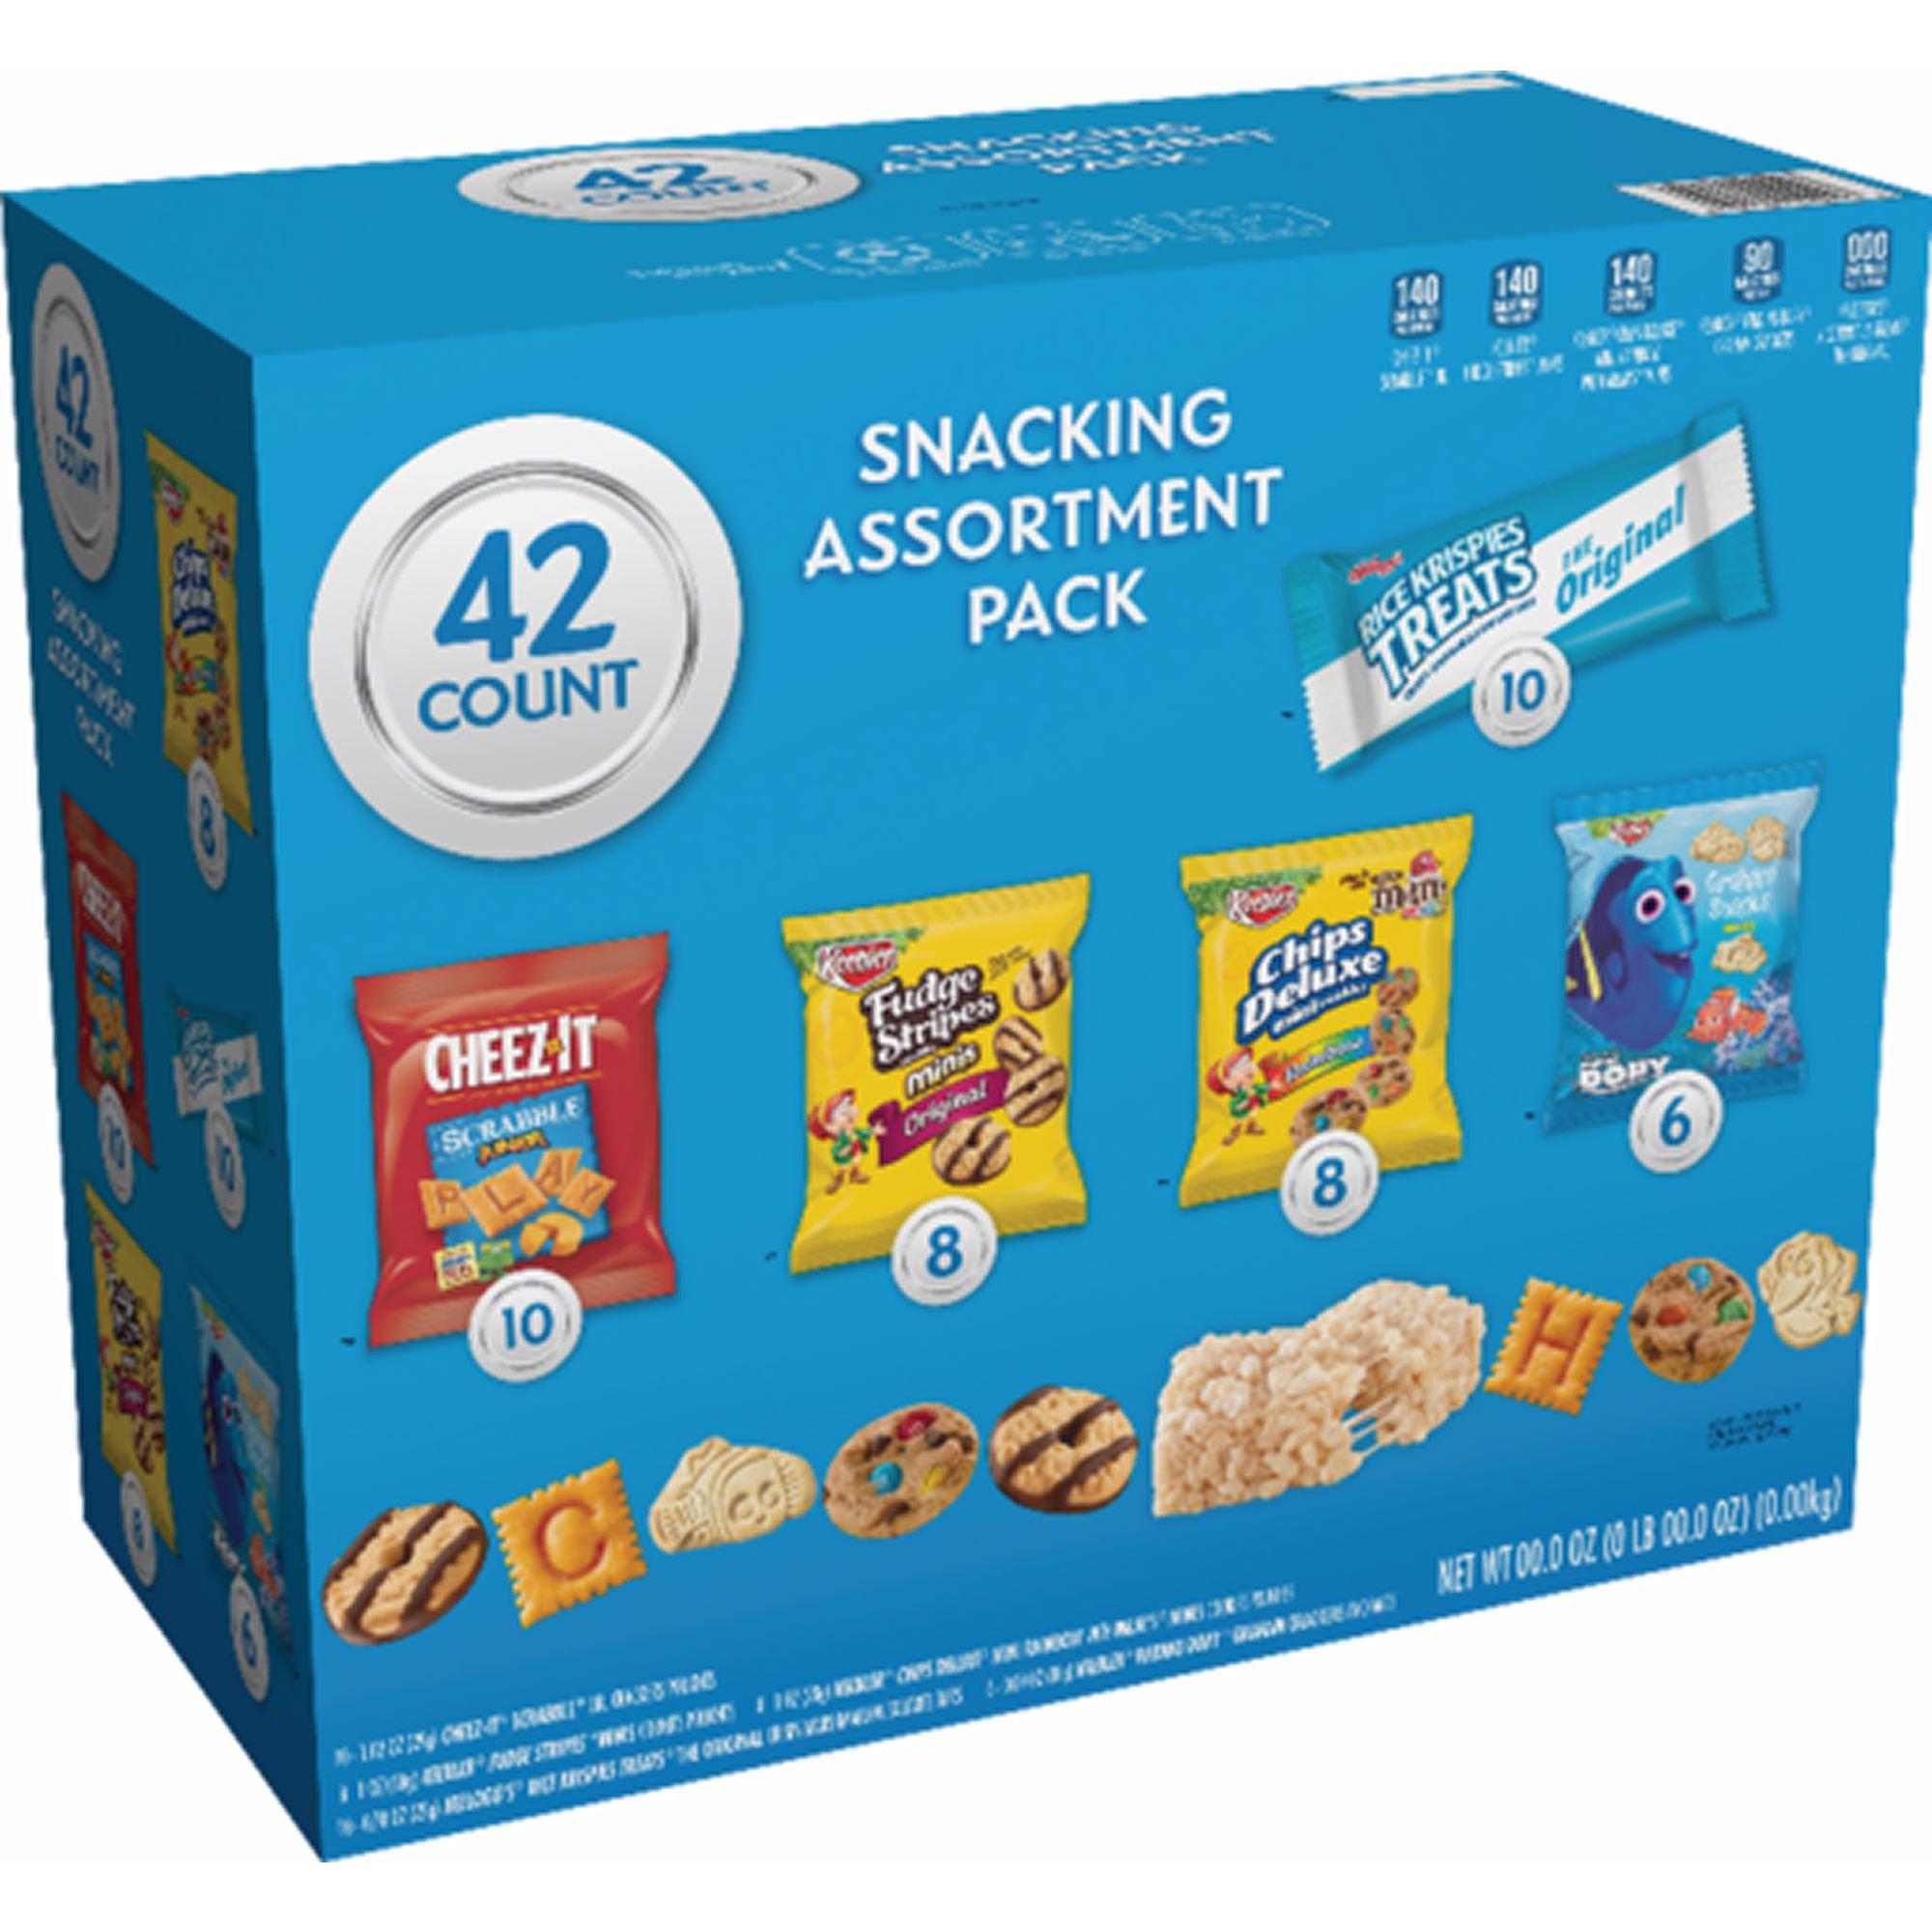 Keebler Cookies and Crackers Variety Pack, 42 ct. (pack of 6)